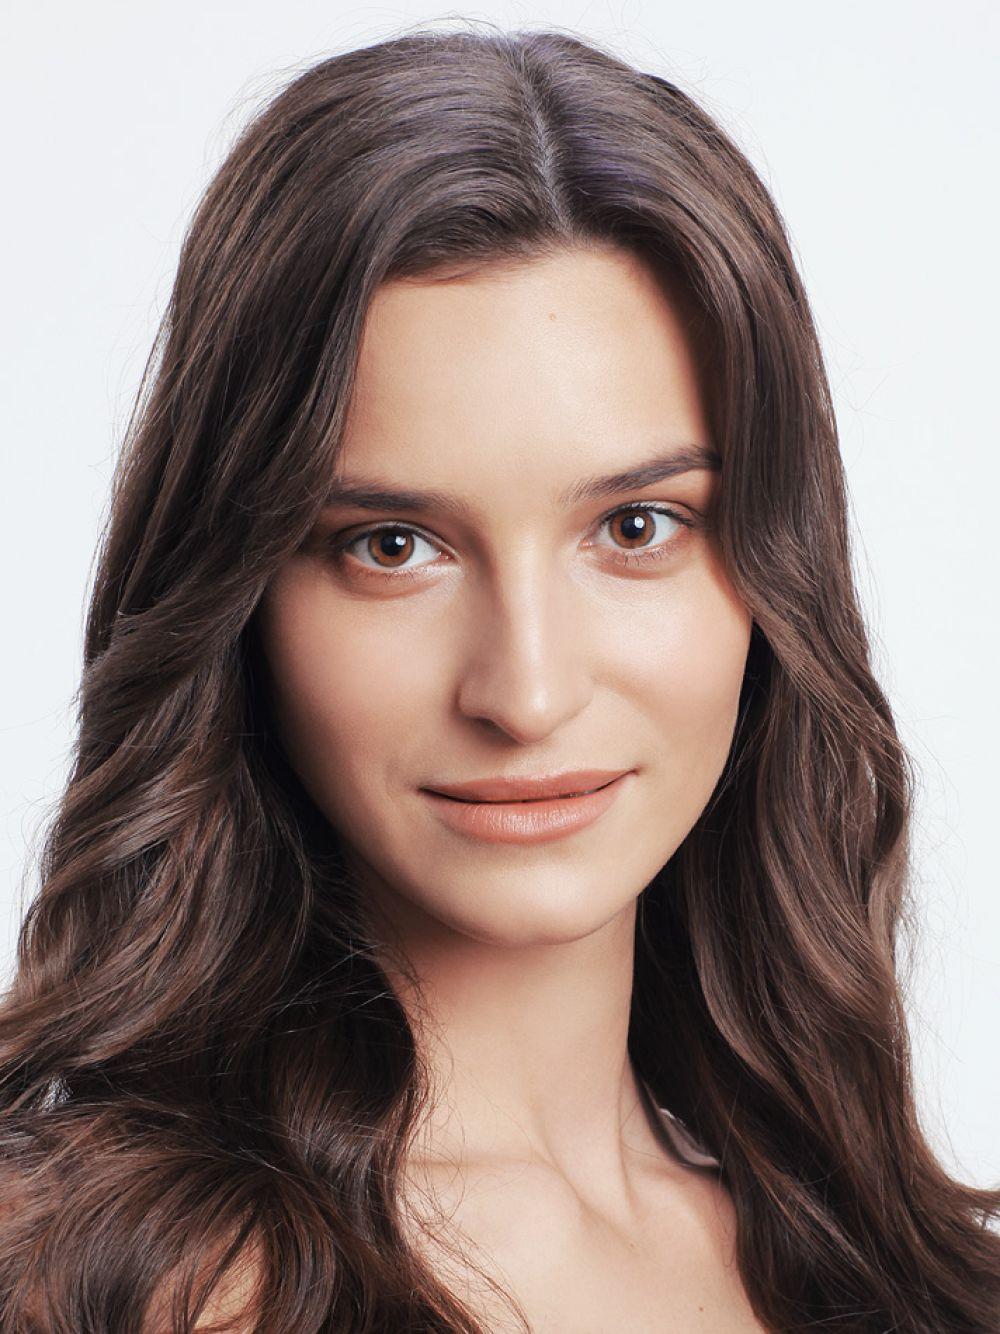 Елена Кучкасова, 23 лет, 171 см.